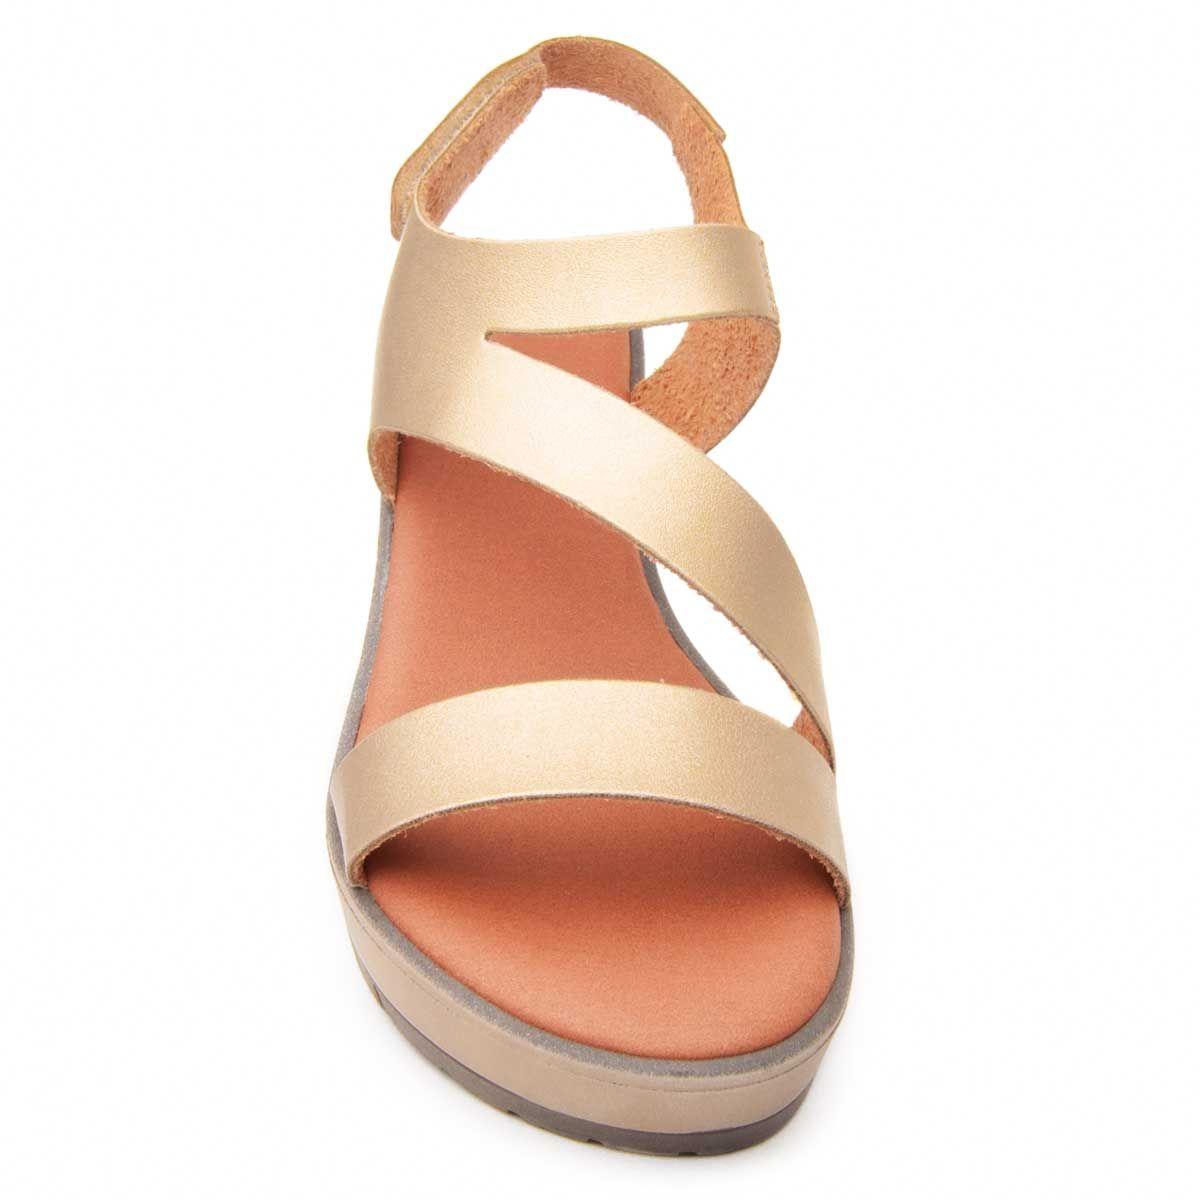 Purapiel Wedge Sandal in Gold